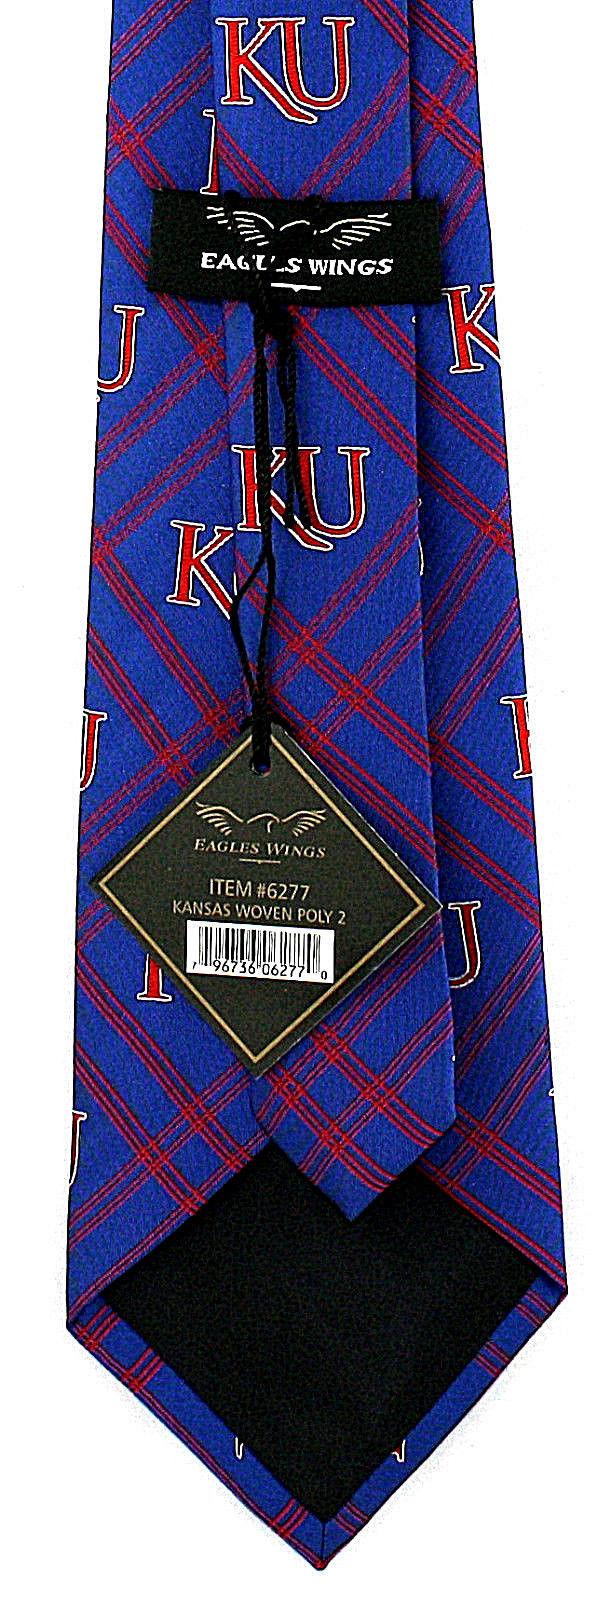 Kansas Jayhawks Diamond Men's Necktie University College X Logo Blue Neck Tie image 2